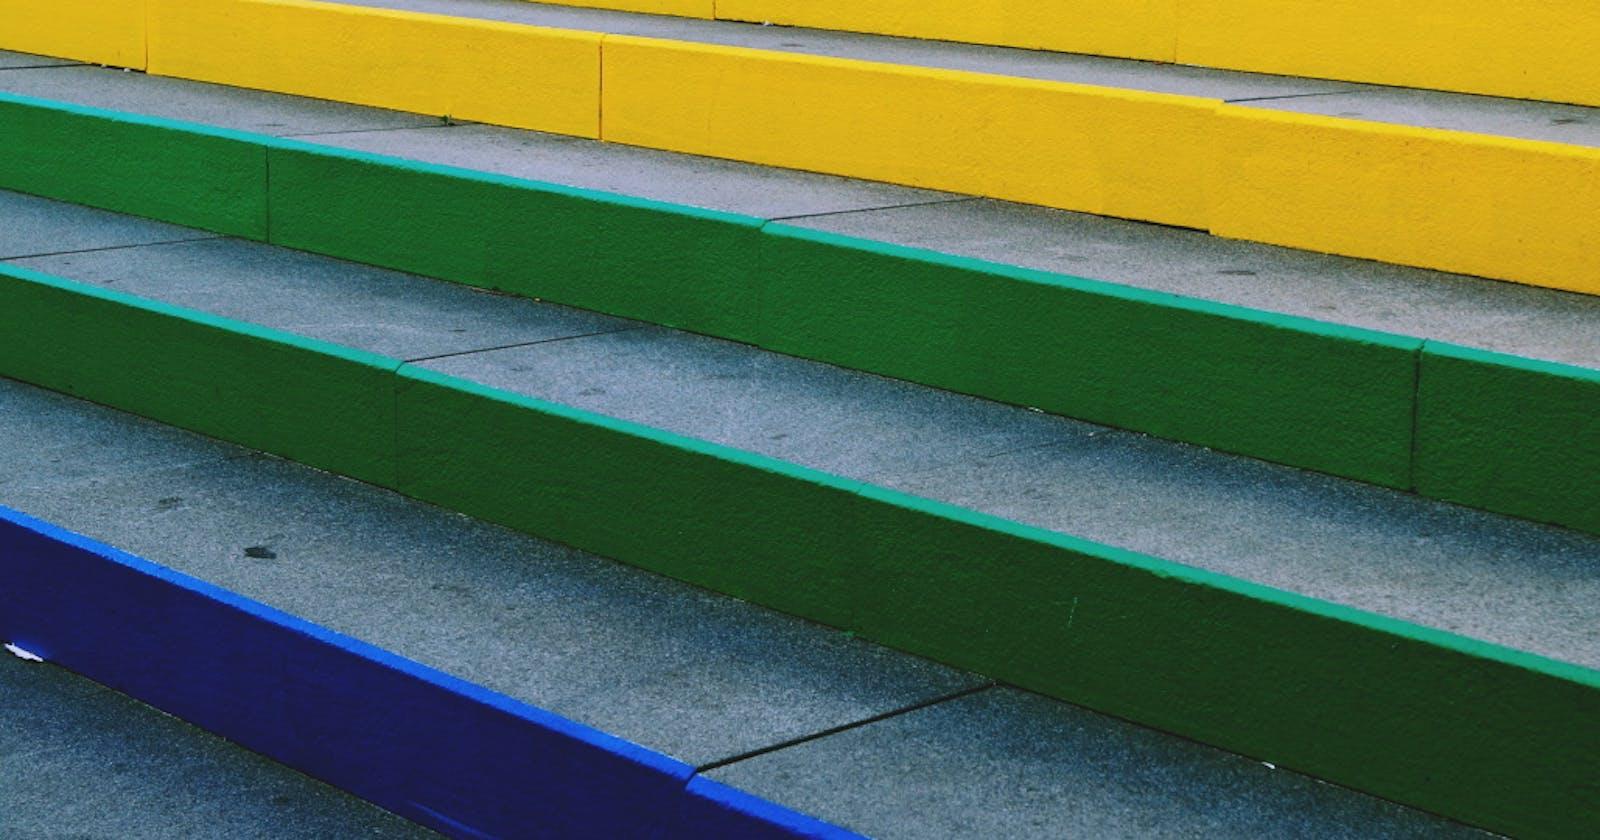 Software in 3 steps: Make it run, make it right, make it fast